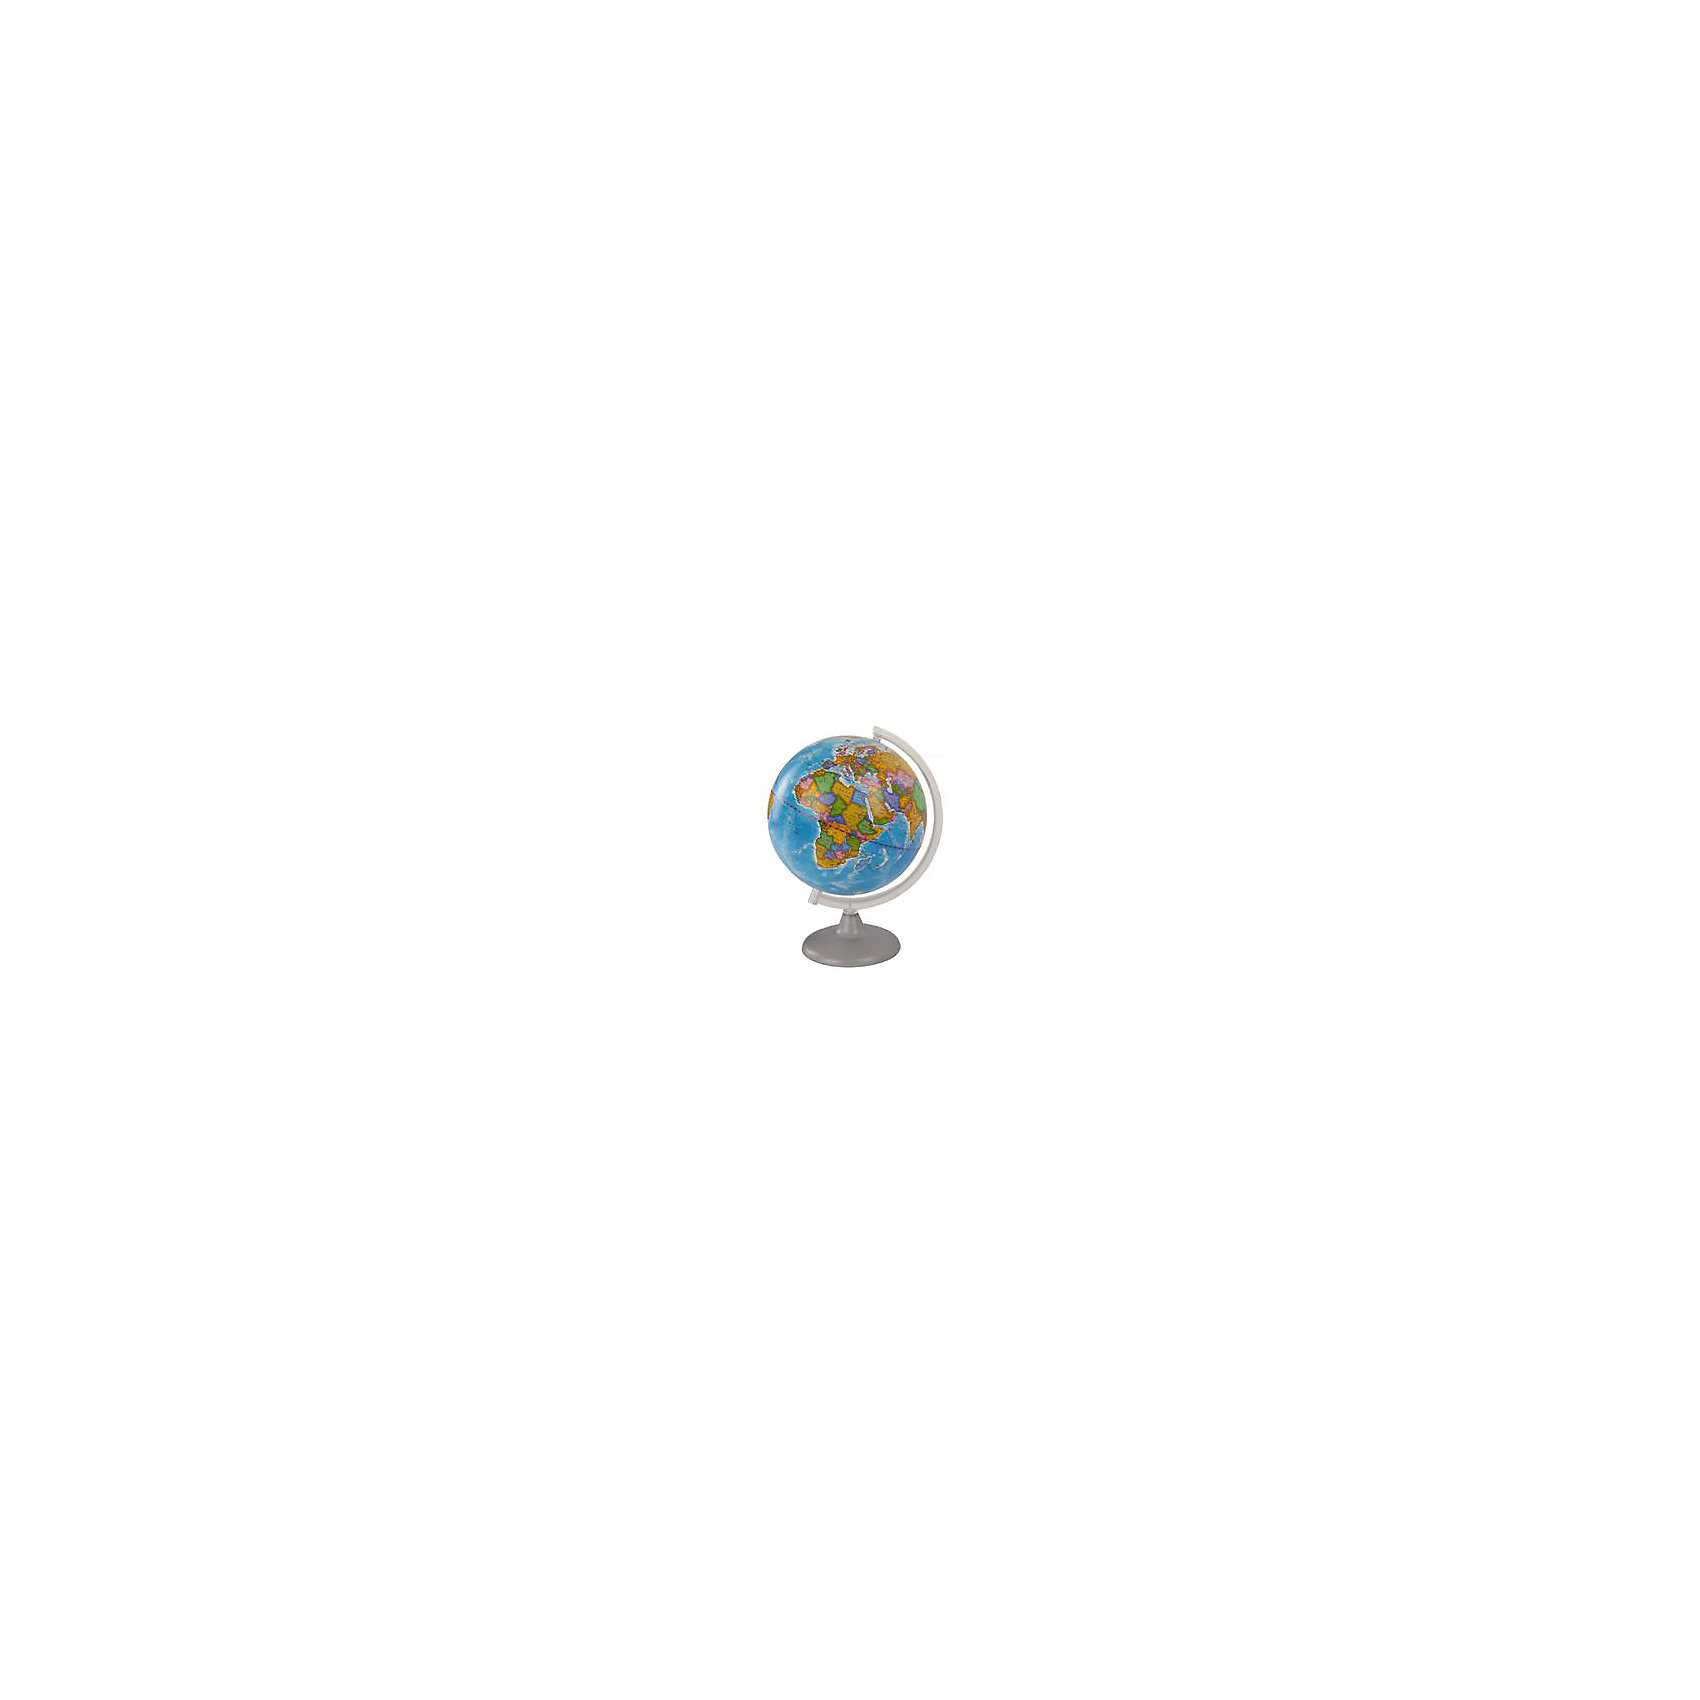 Глобус Земли политический, диаметр 250 ммДиаметр: 250 мм<br><br>Масштаб: 1:50000000<br><br>Материал подставки: Пластик<br><br>Цвет подставки: Прозрачный<br><br>Ширина мм: 260<br>Глубина мм: 260<br>Высота мм: 360<br>Вес г: 800<br>Возраст от месяцев: 72<br>Возраст до месяцев: 2147483647<br>Пол: Унисекс<br>Возраст: Детский<br>SKU: 5518219